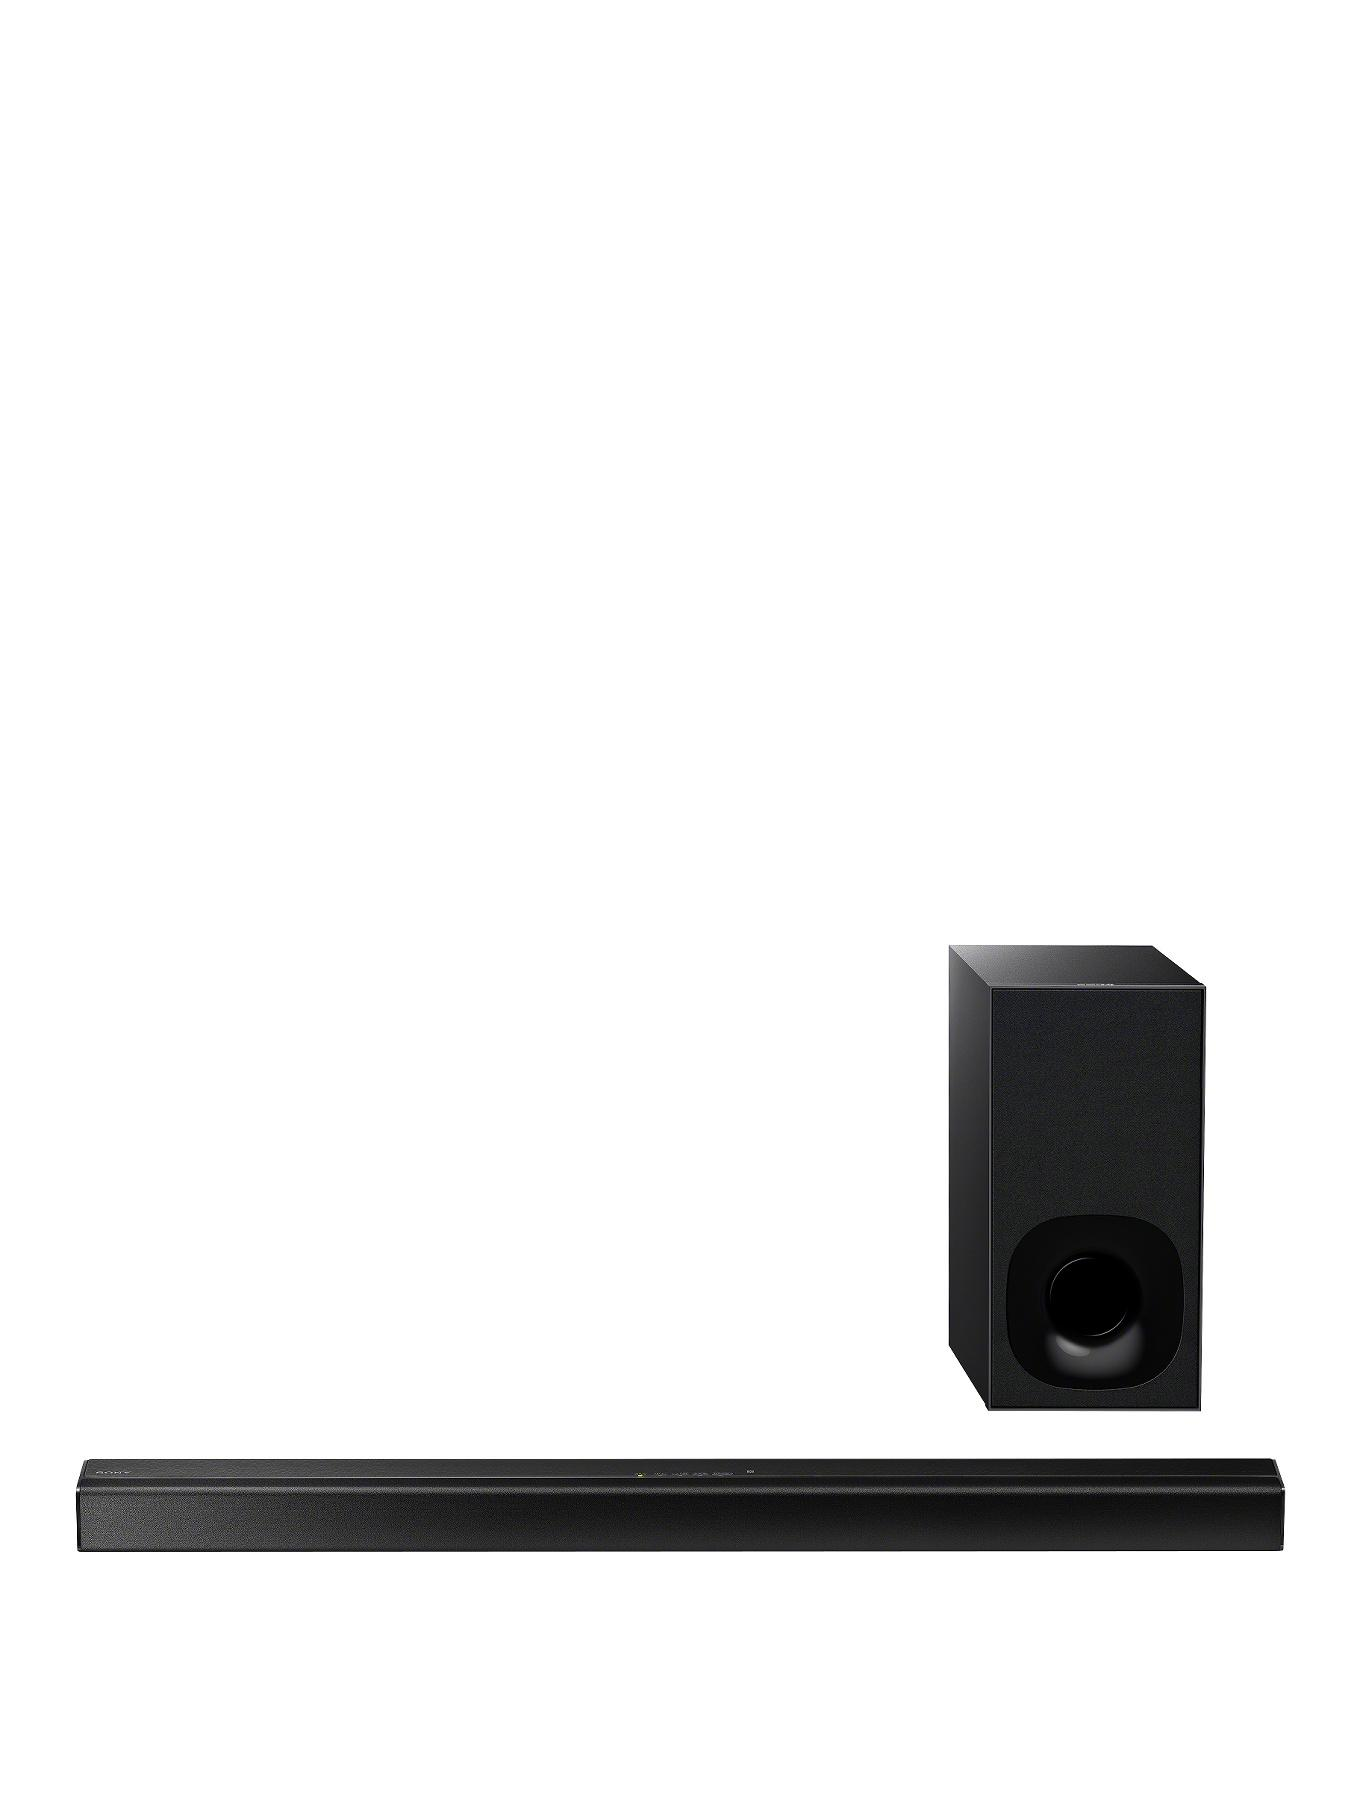 Image of HT-CT180BT 100-watt Bluetooth Soundbar with Wireless Subwoofer